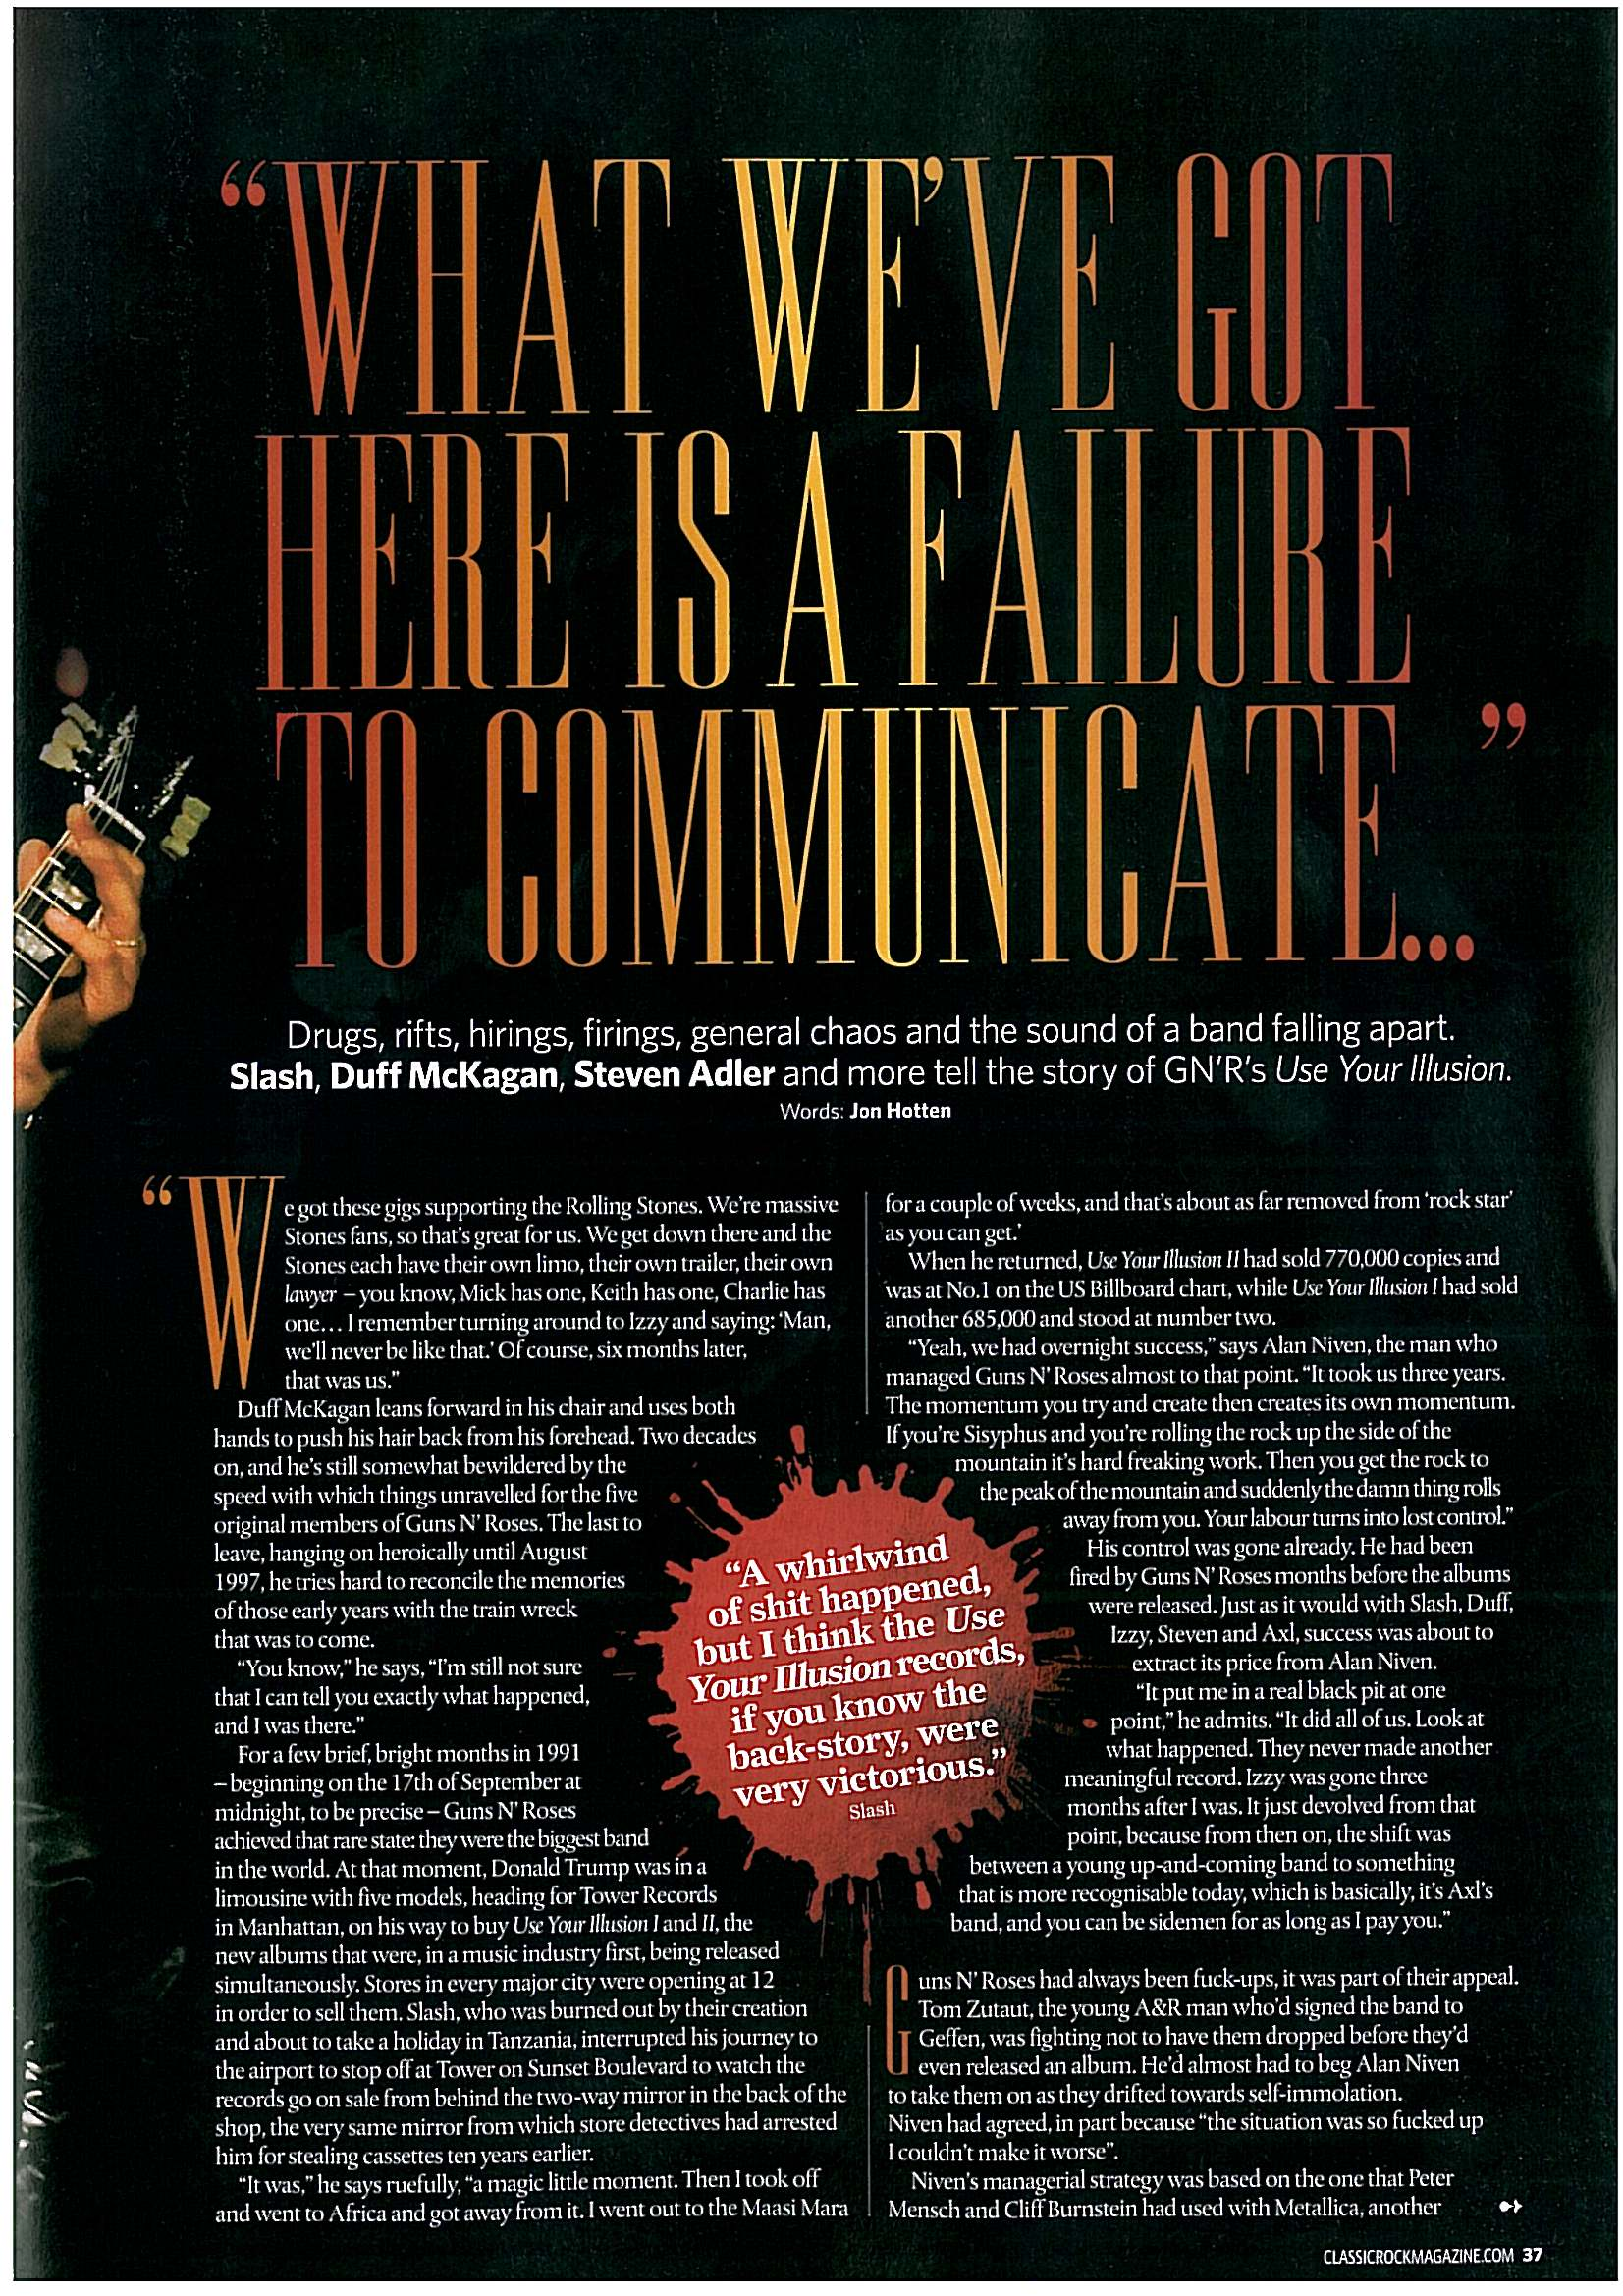 2011.06.DD - Classic Rock Magazine - Behind Use Your Illusion UPuYYrM8_o